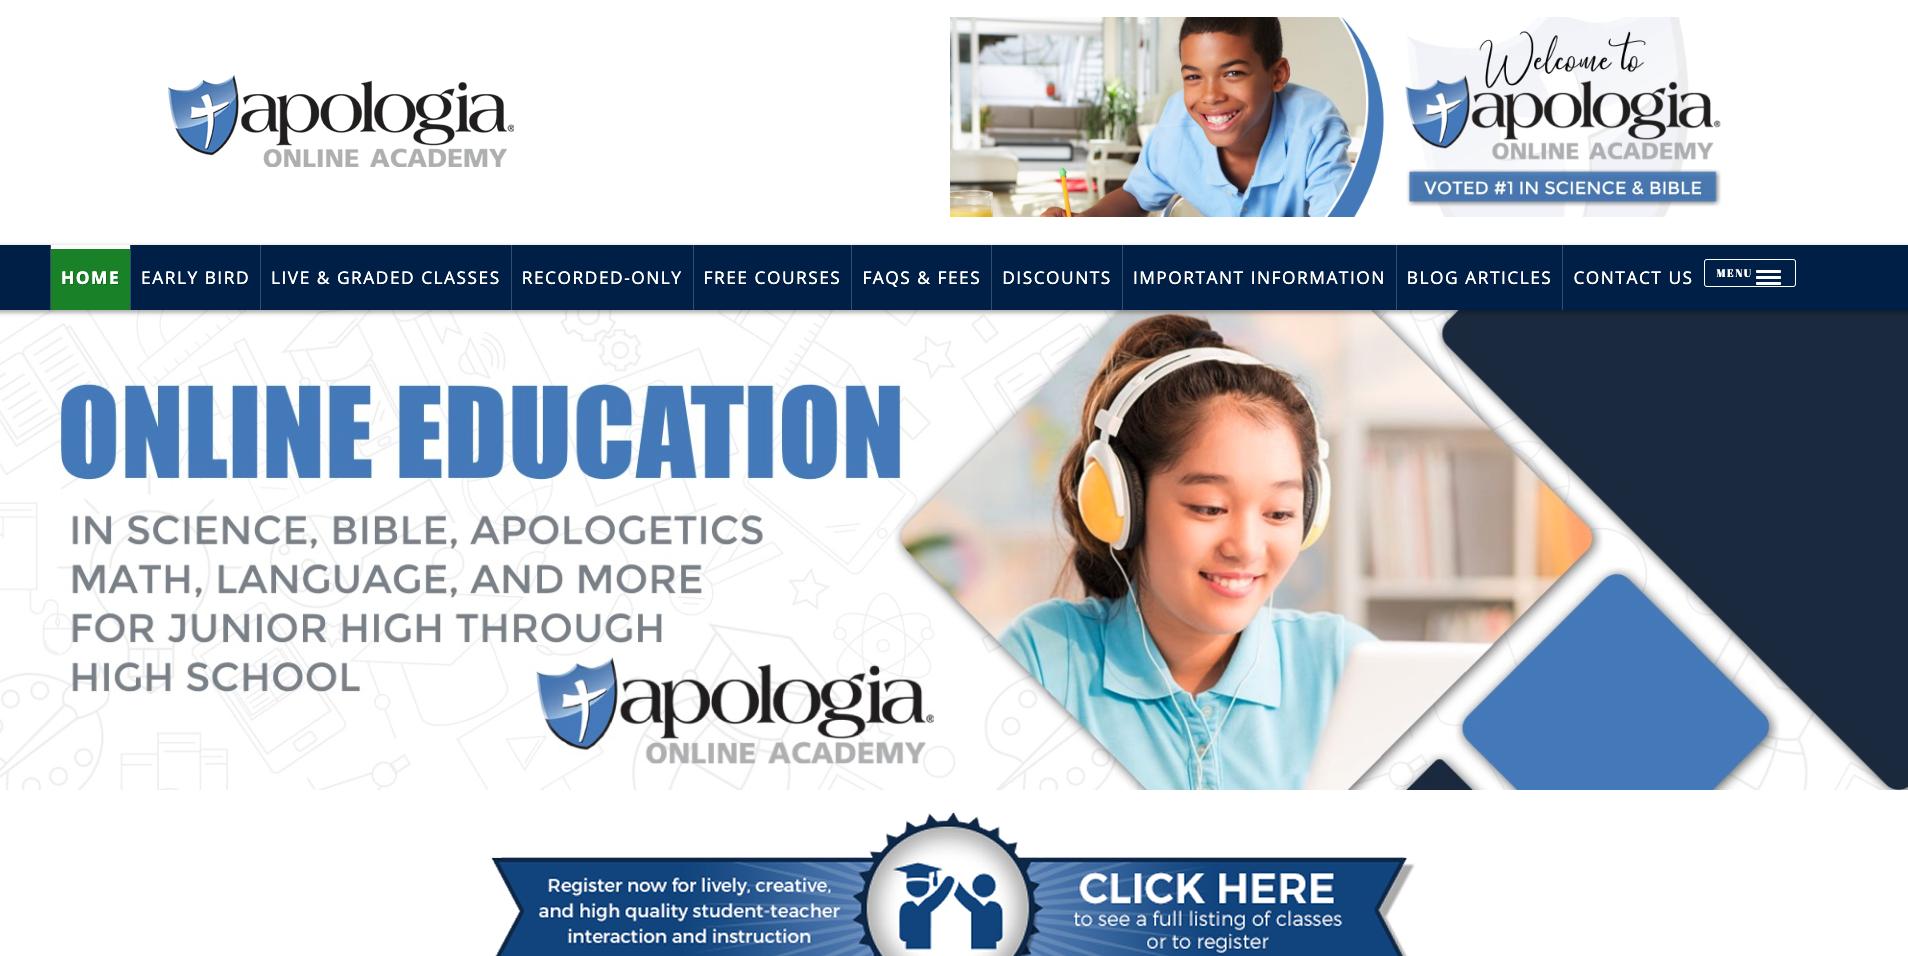 Apologia Online Academy